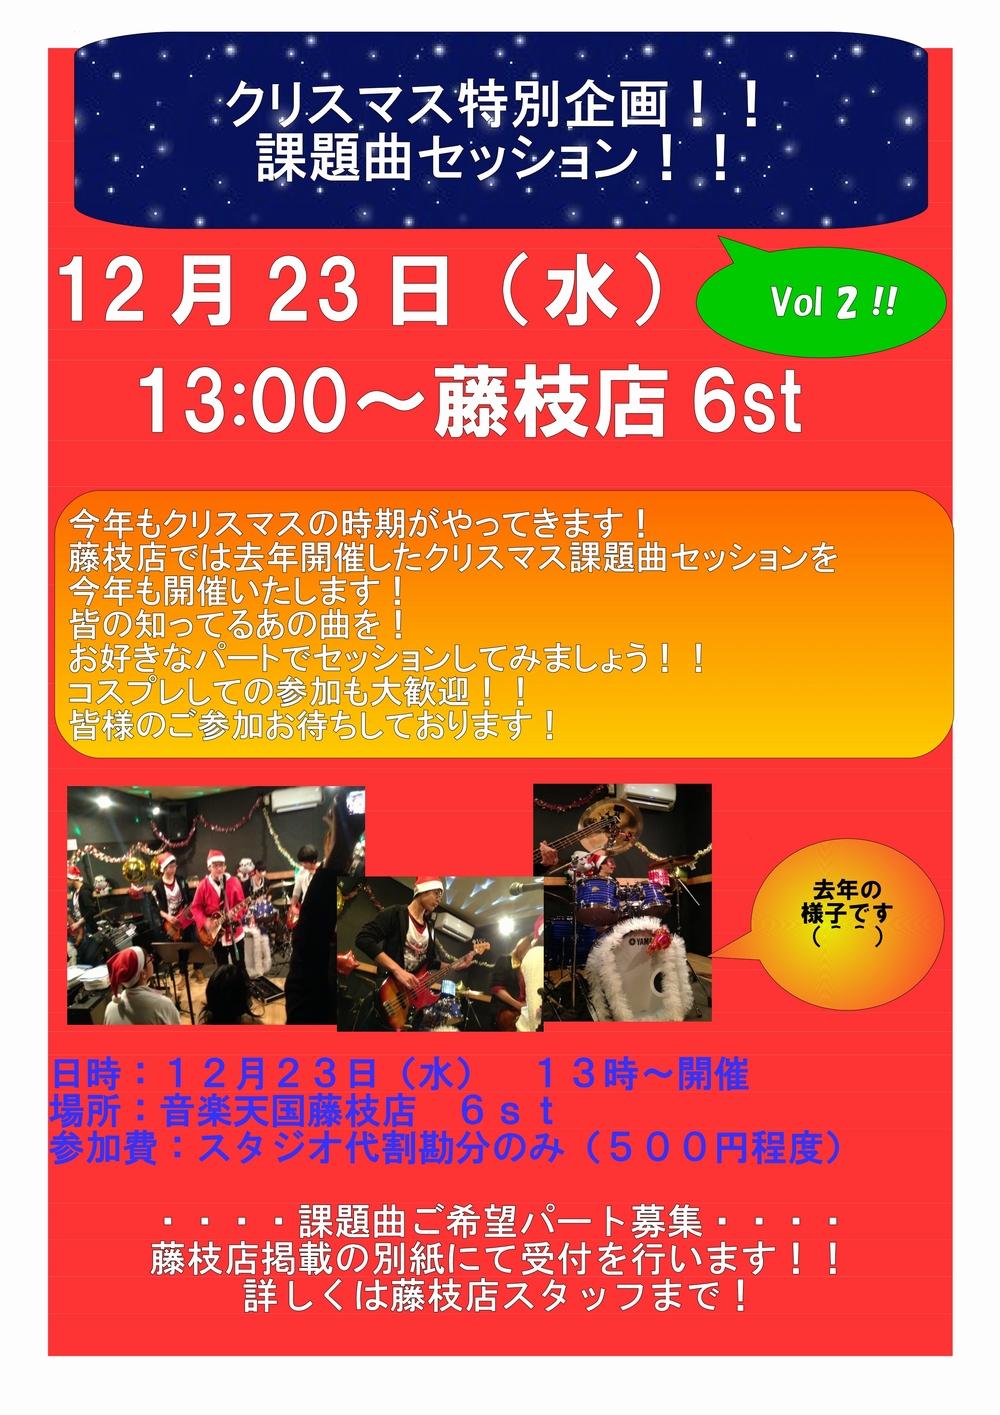 【セッション天国】X'mas企画@音楽天国・藤枝店12月23日(水)開催!